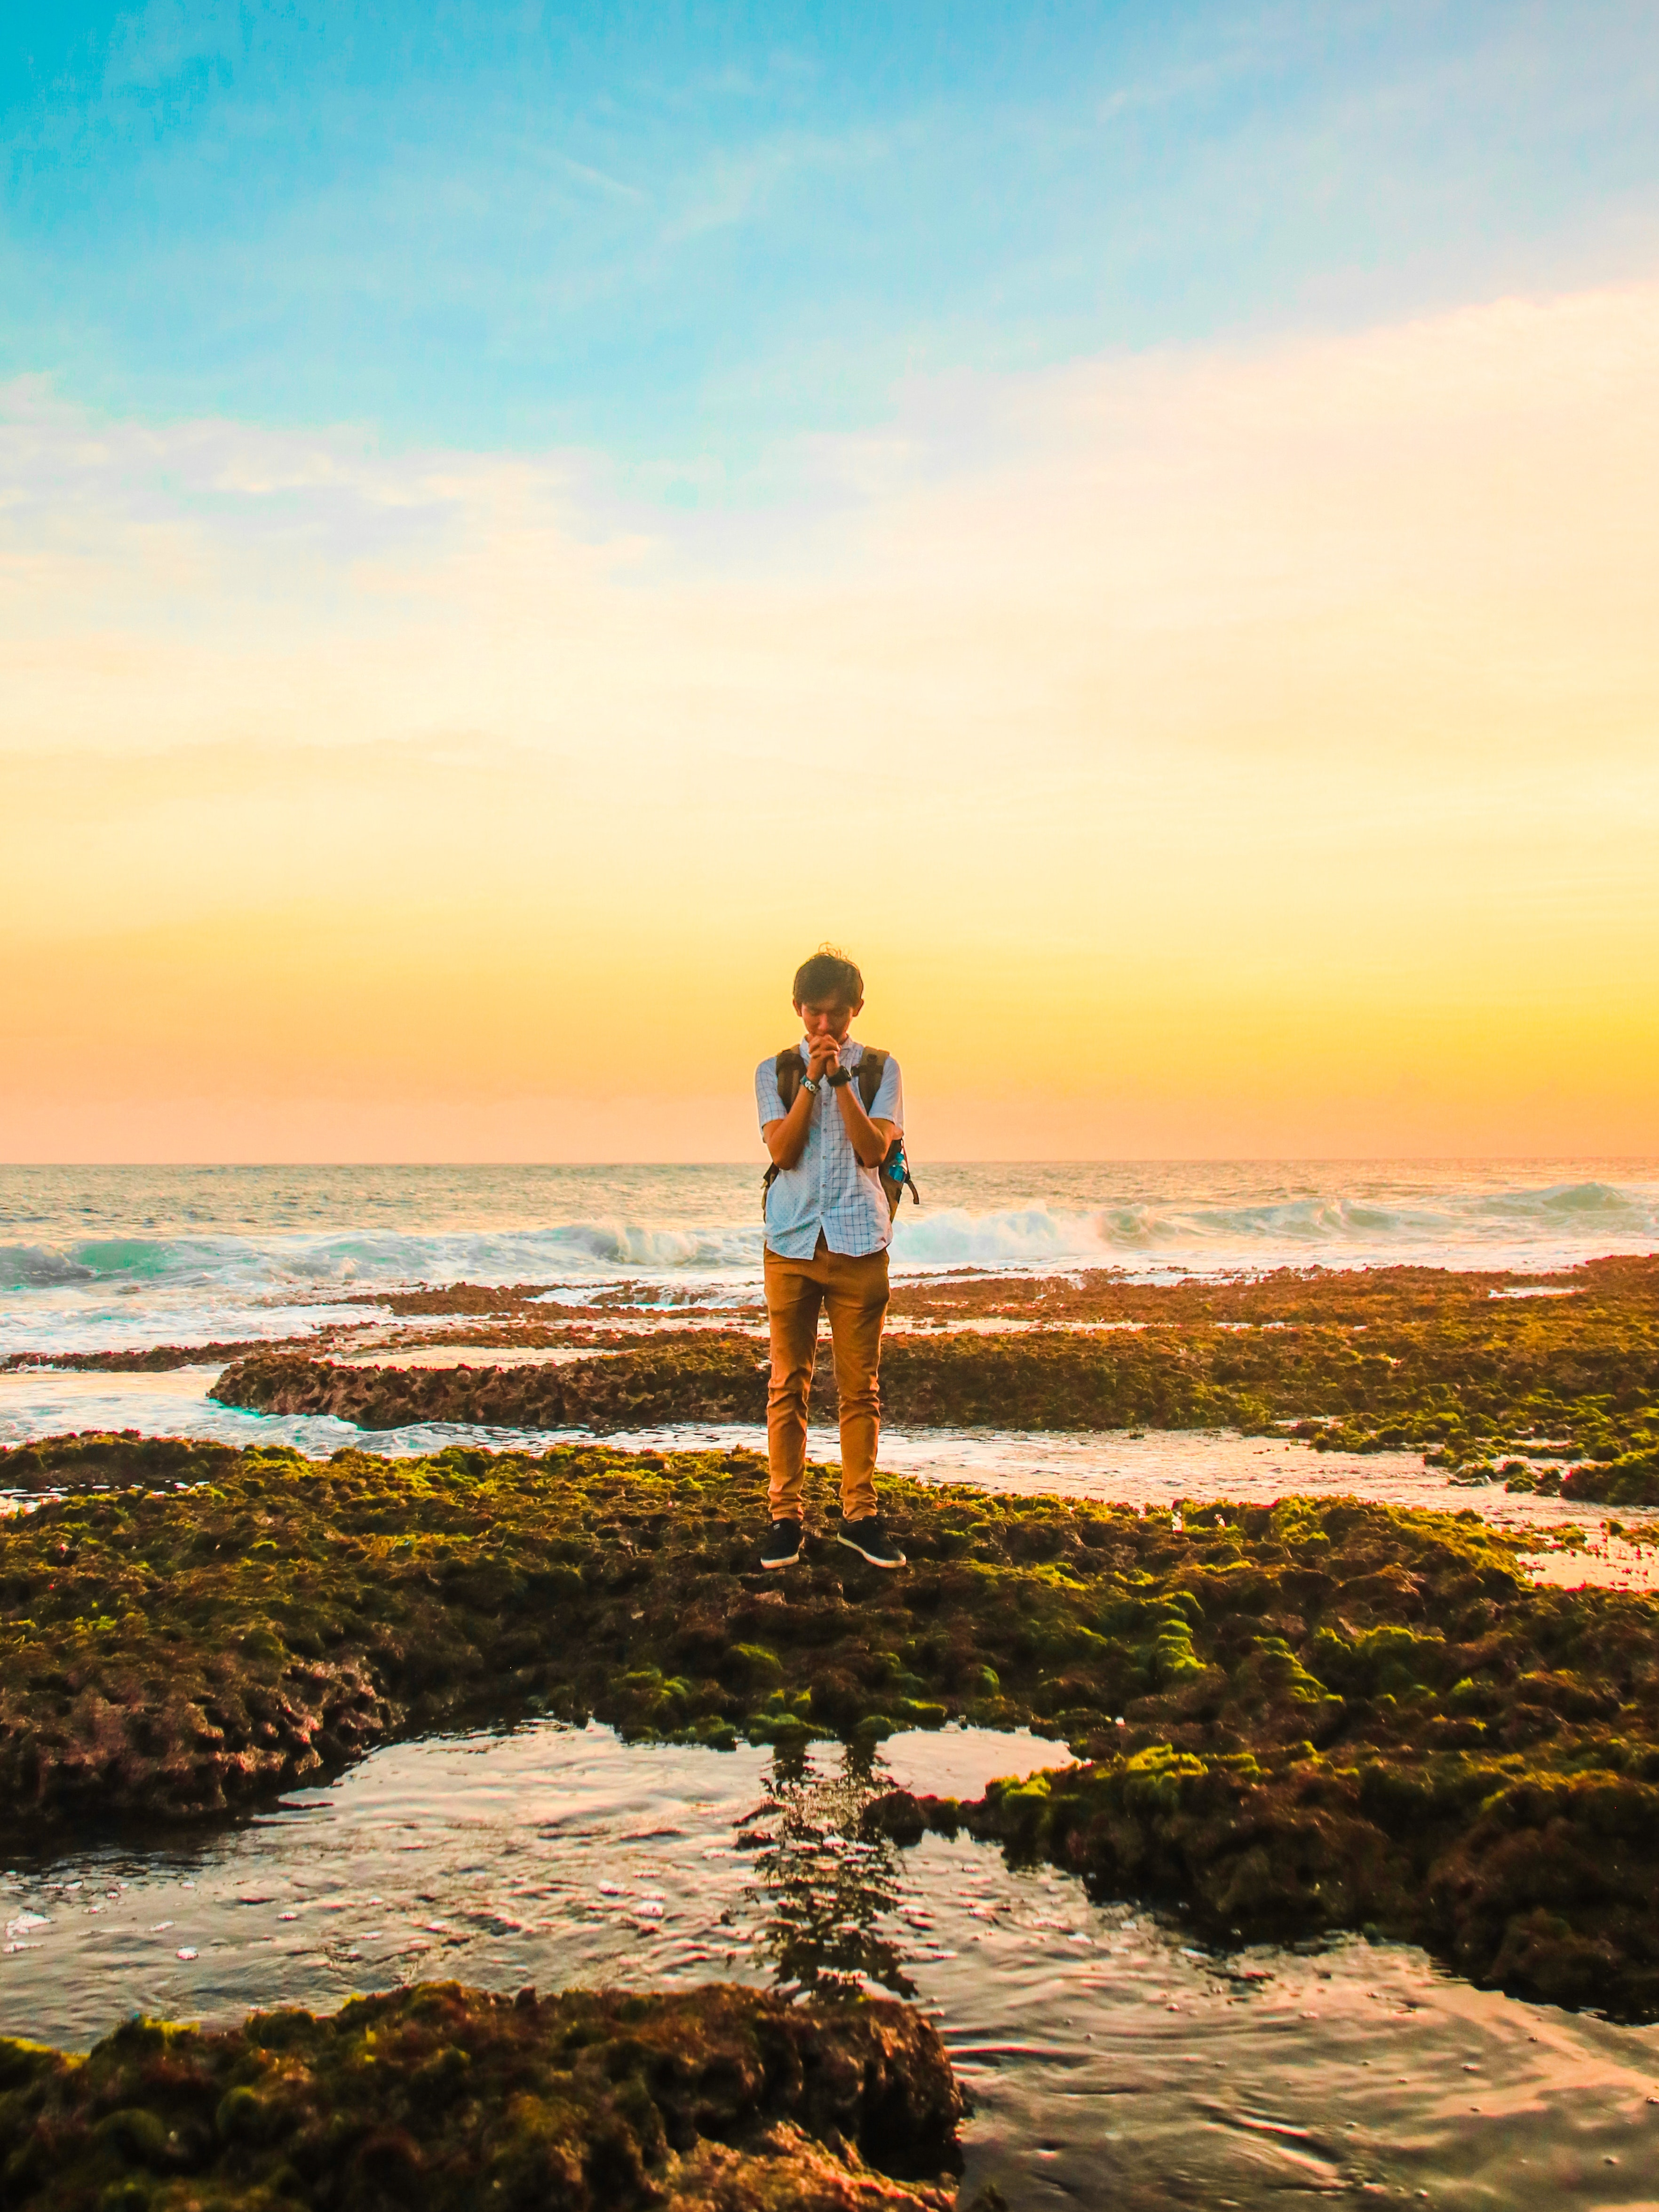 Man Standing on Rocks Near Beach during Golden Hour, Seashore, Pray, Recreation, Reflections, HQ Photo